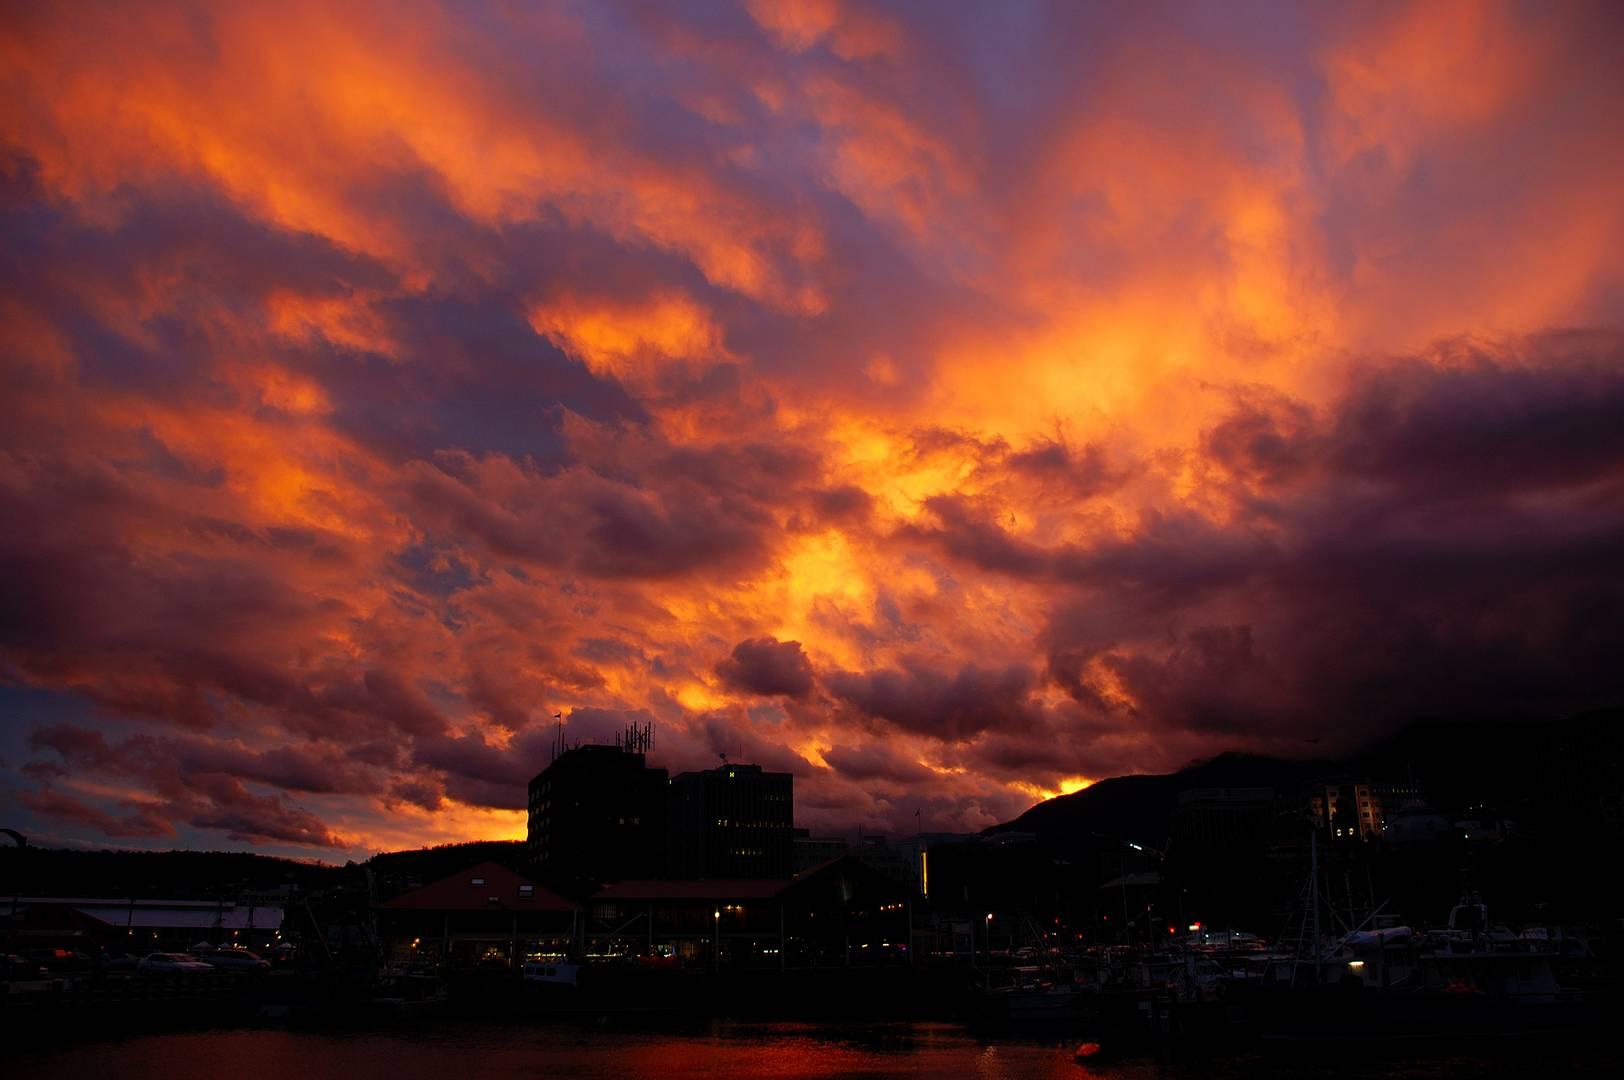 Hobart`s Himmel in Flammen